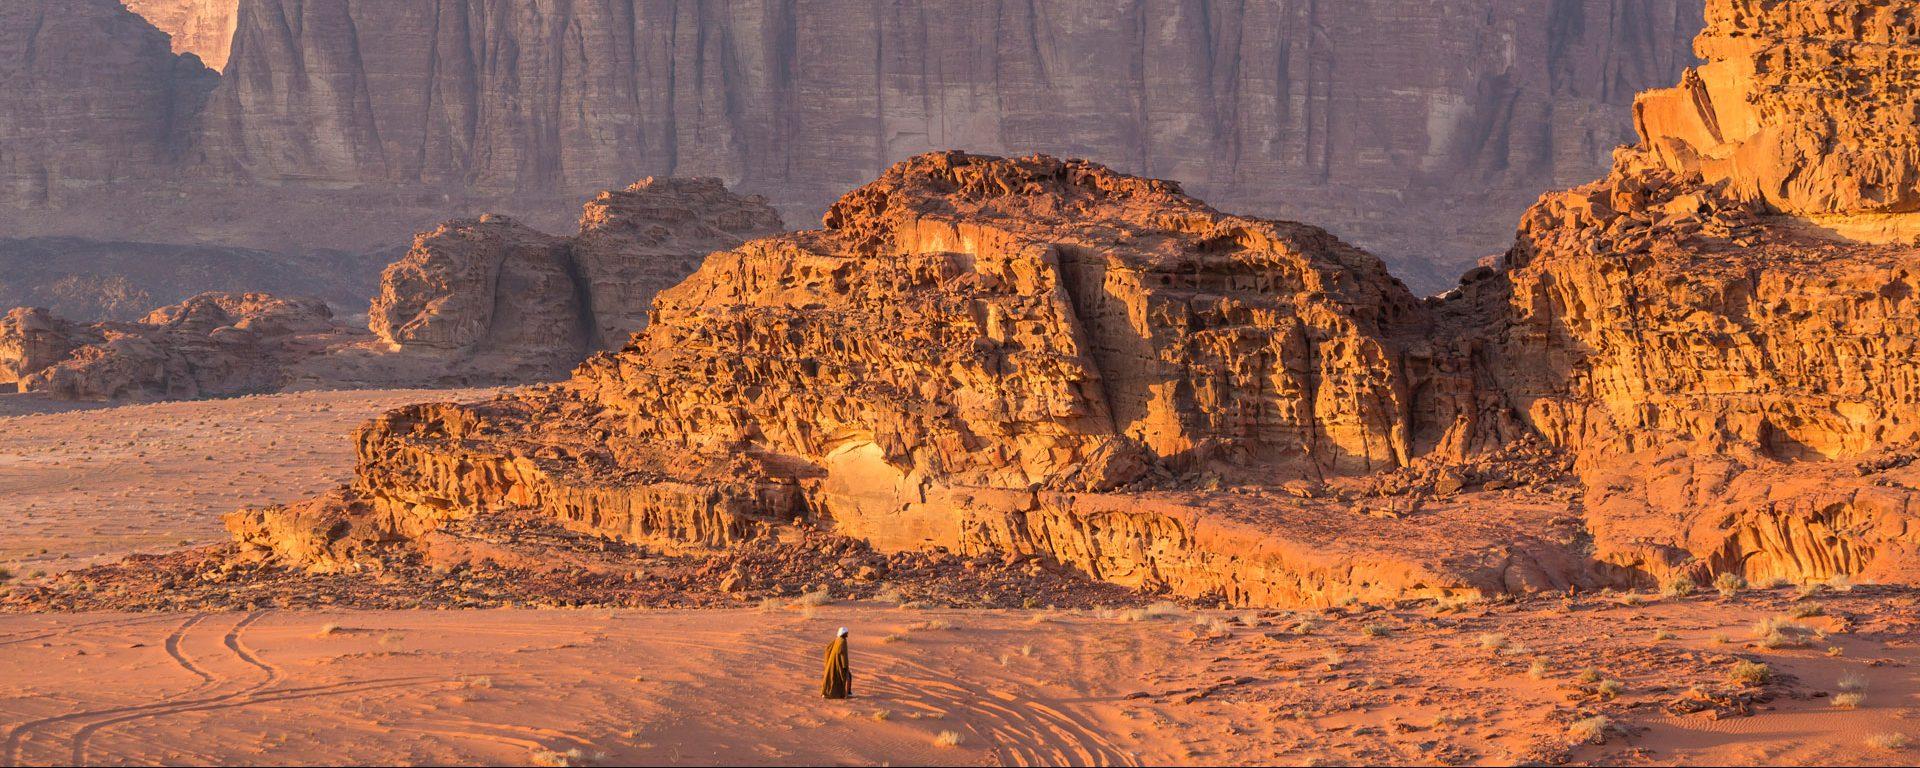 Bedouin man walking across desert, Wadi Rum, Jordan